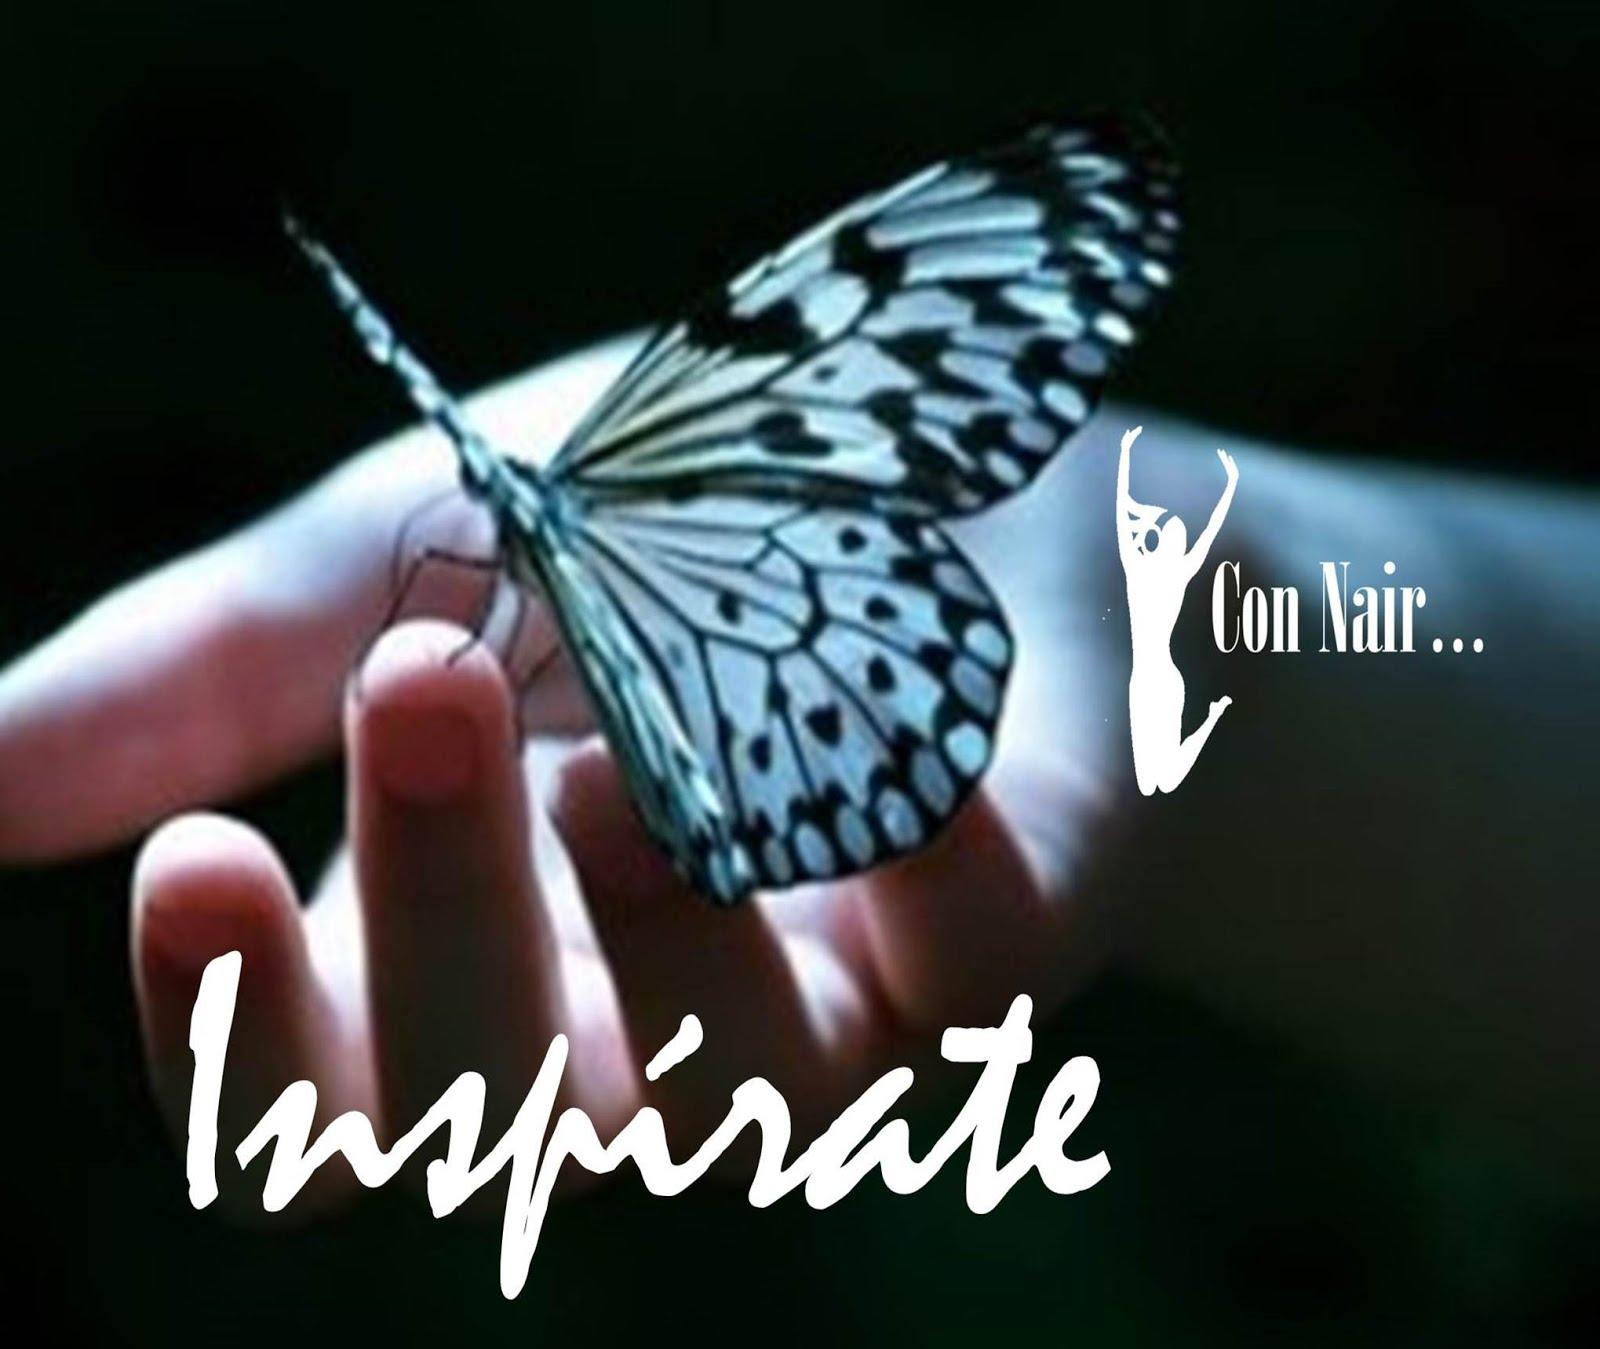 Inspirate